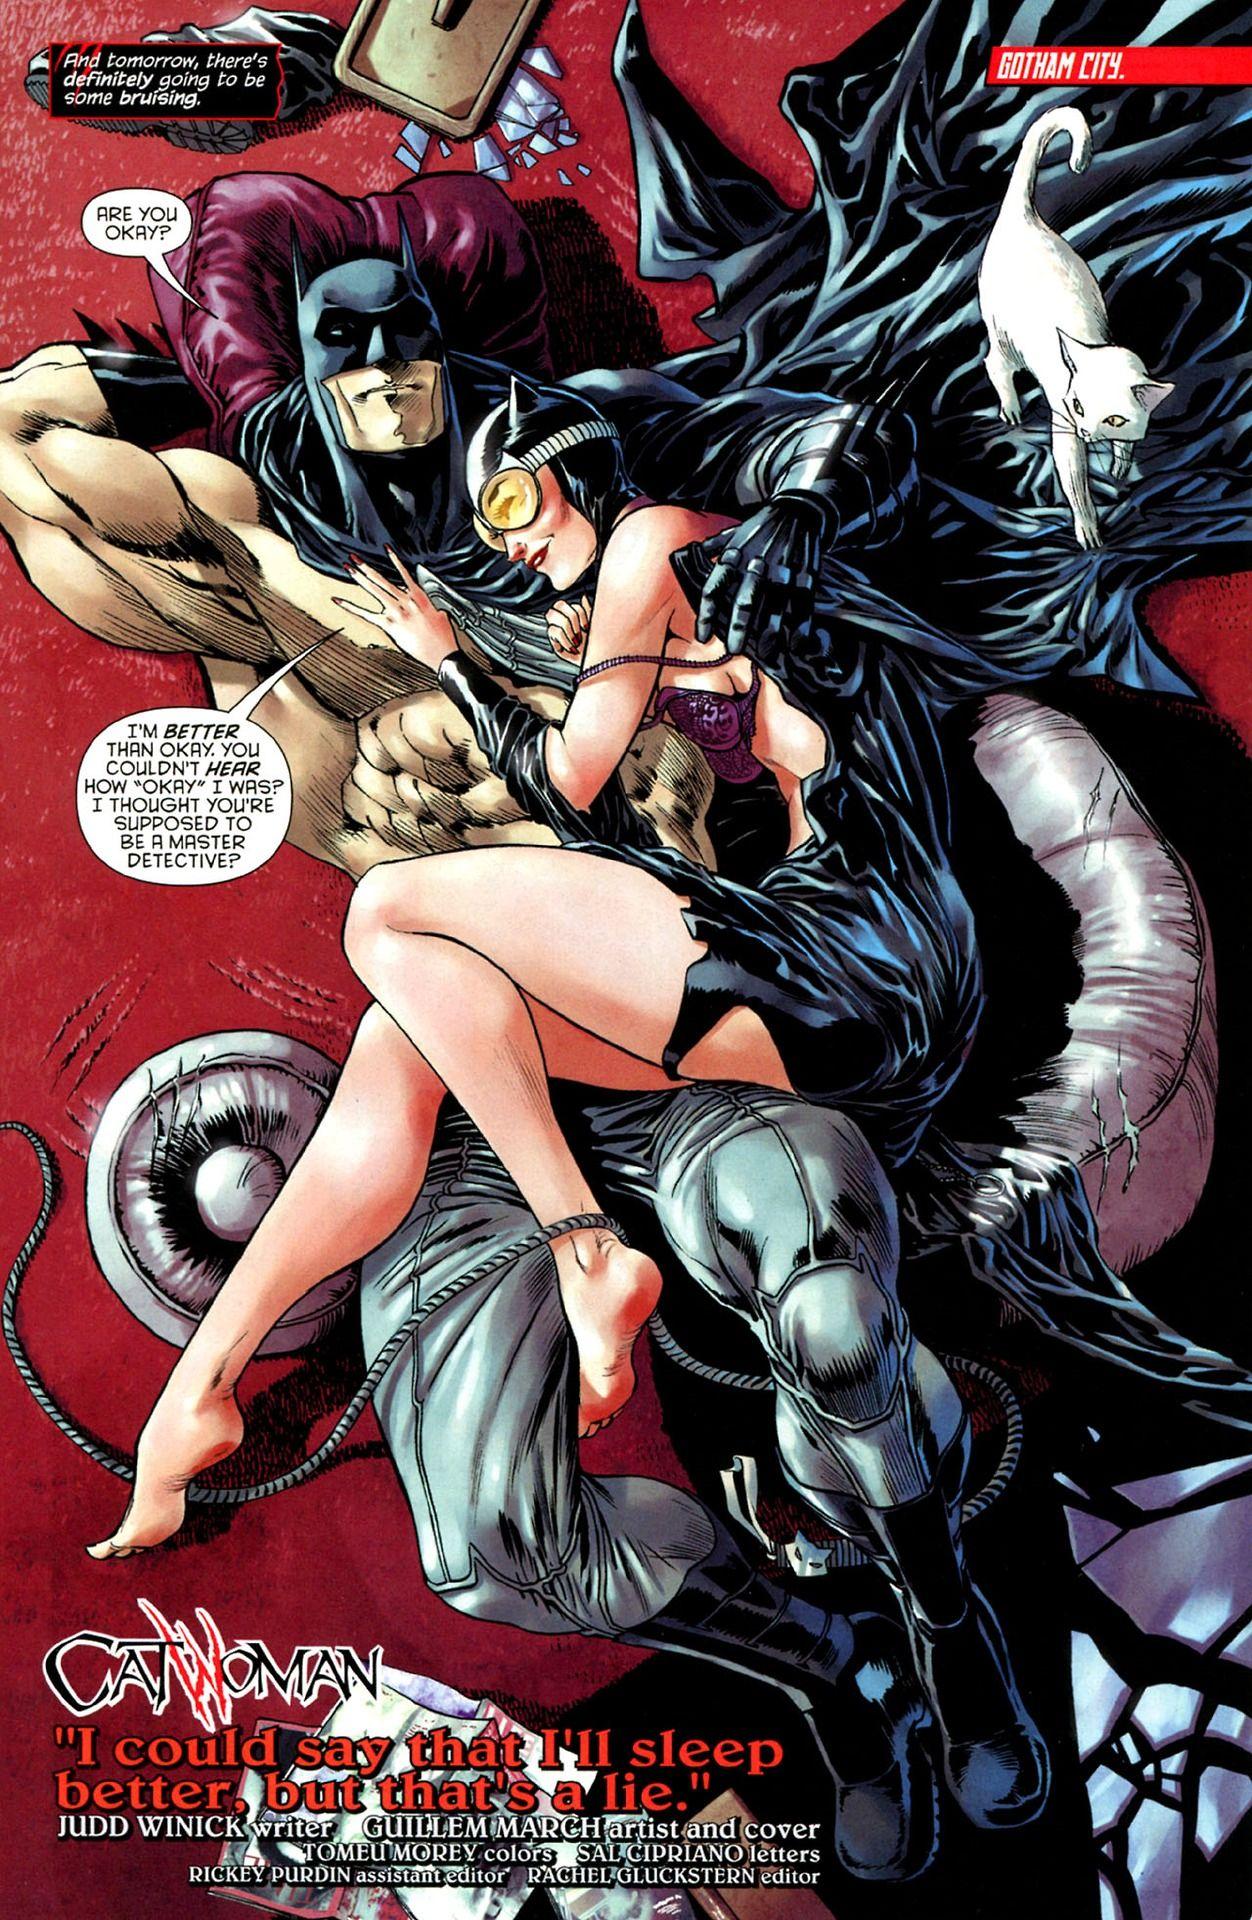 Catwoman and batman romance